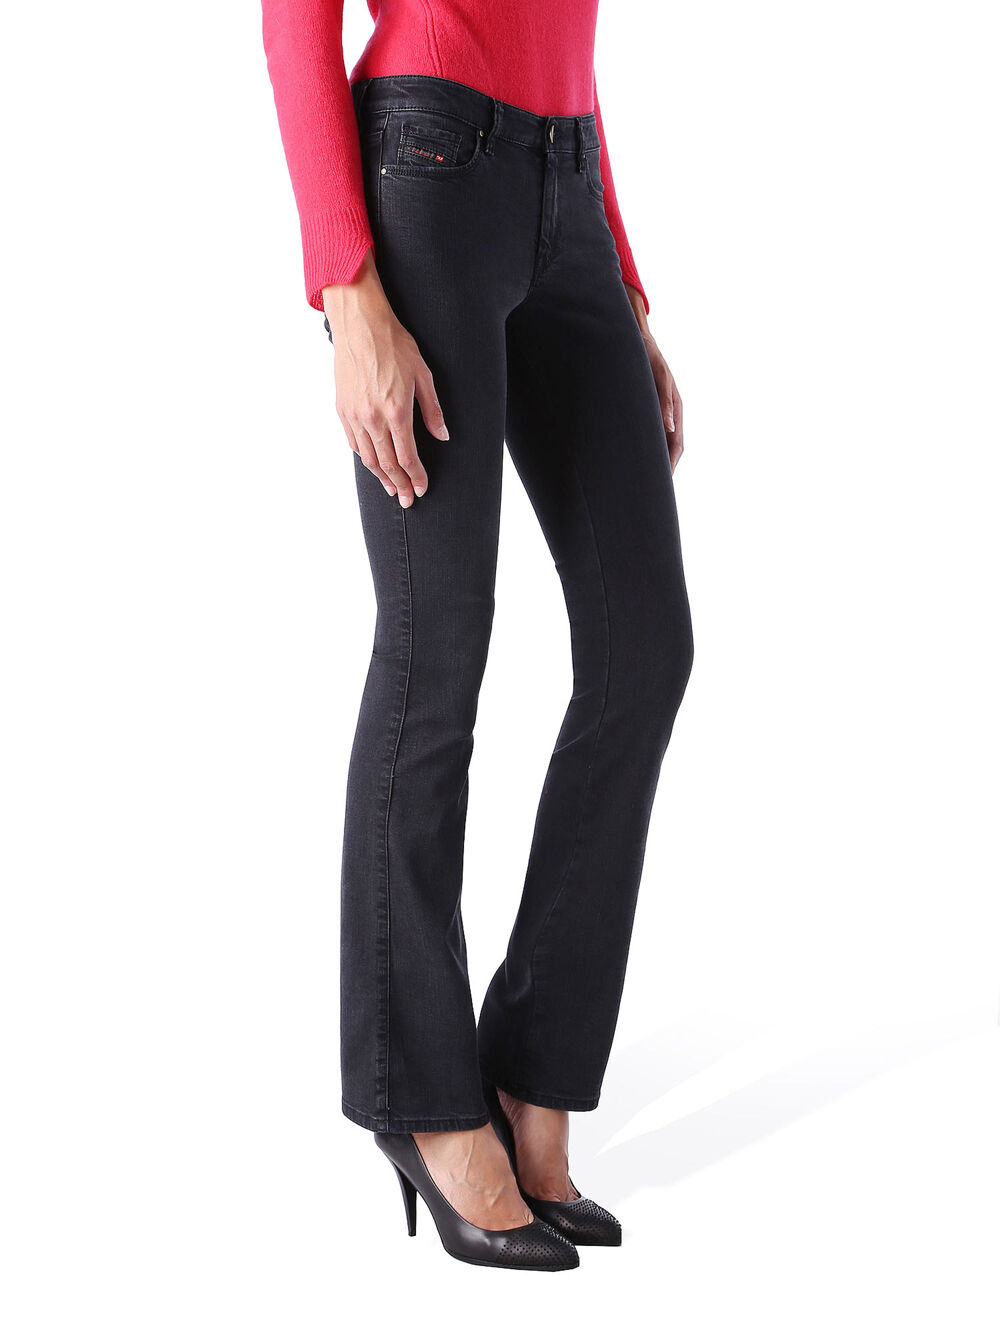 Diesel Doris-B 0668C Jeans Pantaloni women Super-Sottile Svasati